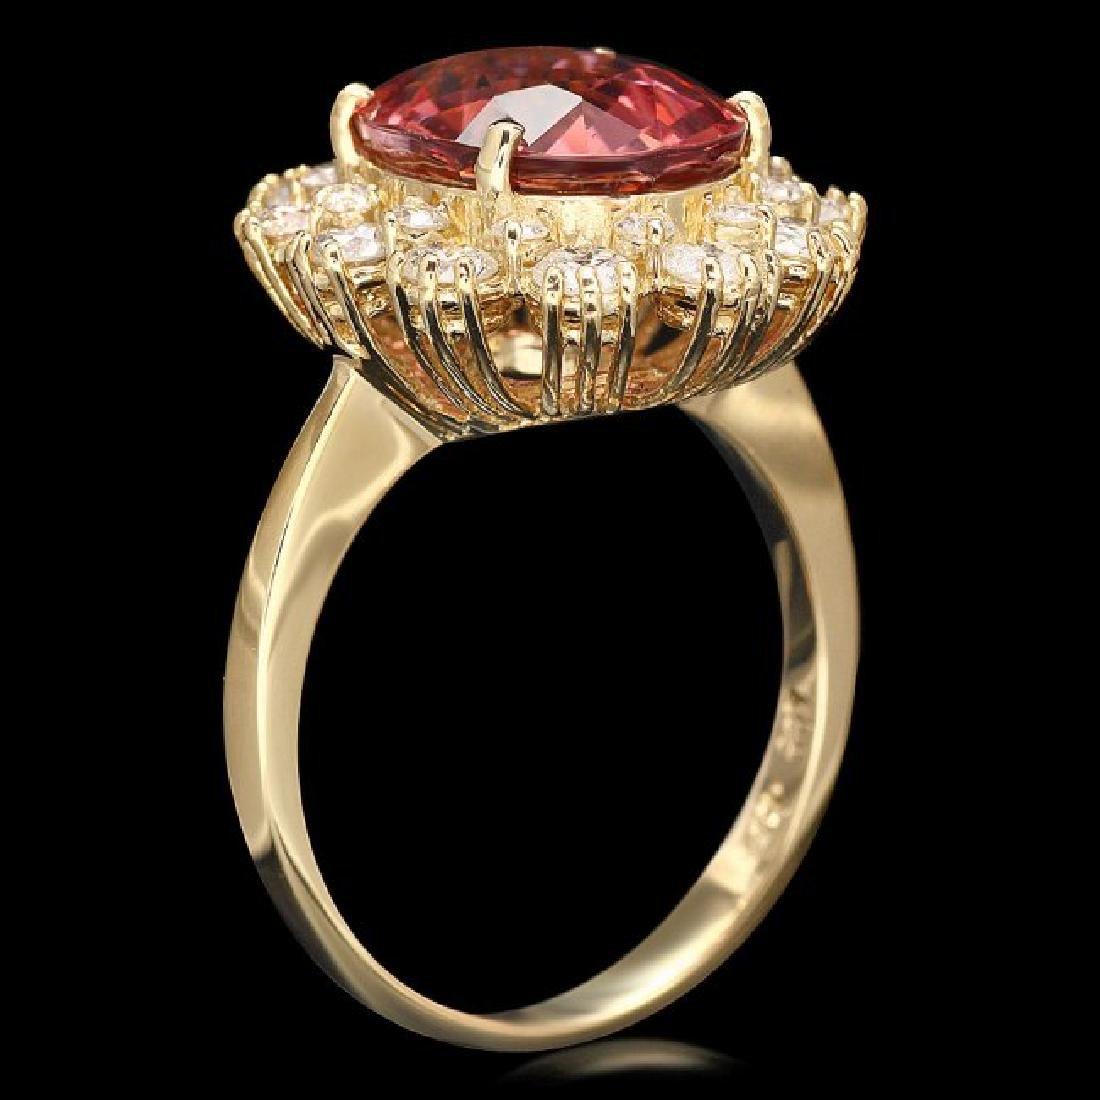 14k Gold 5ct Tourmaline 1.20ct Diamond Ring - 3